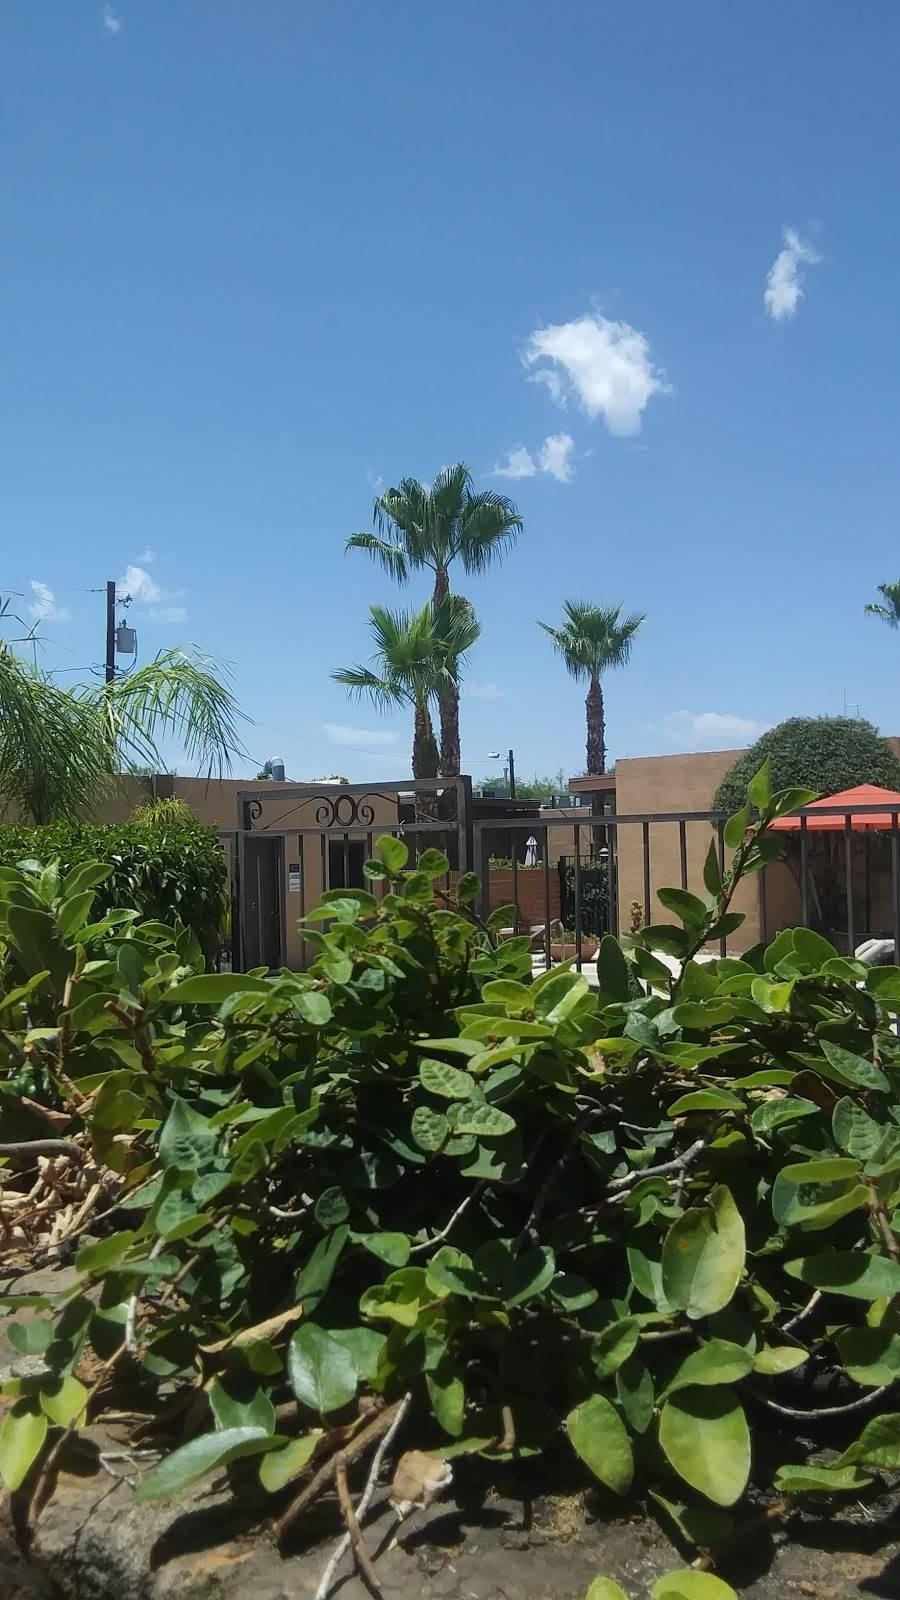 Riverside Suites - real estate agency    Photo 2 of 10   Address: 1725 E Limberlost Dr, Tucson, AZ 85719, USA   Phone: (520) 202-2210